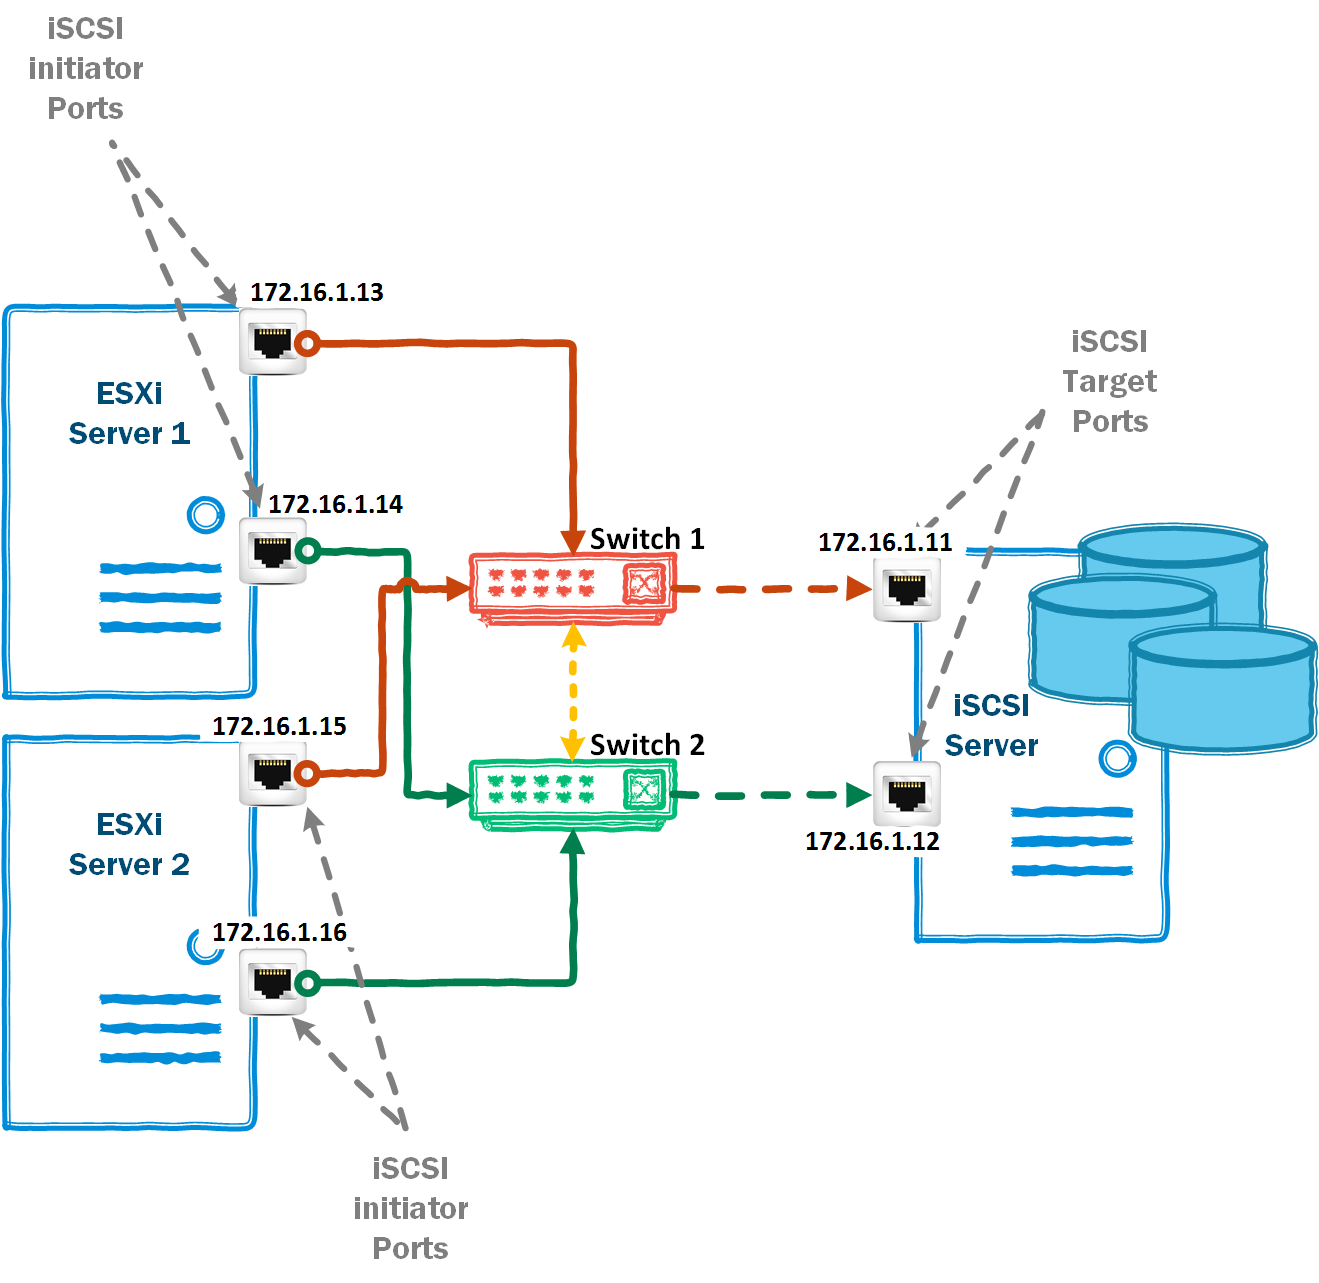 vGeek: Configuring Microsoft iSCSI Target datastore on Esxi